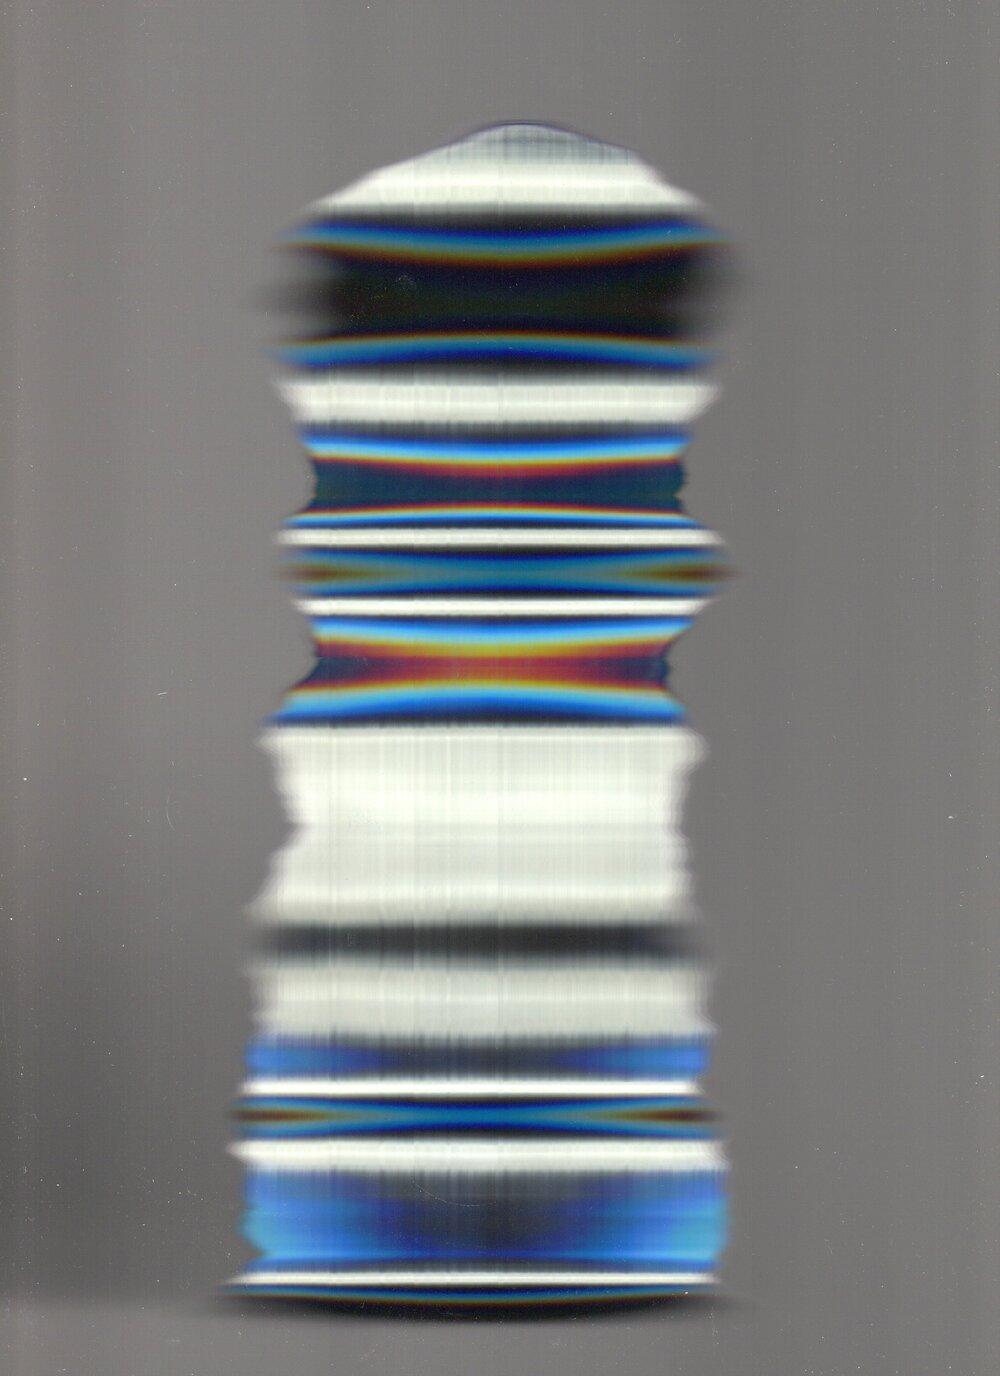 TDK CD-RW700